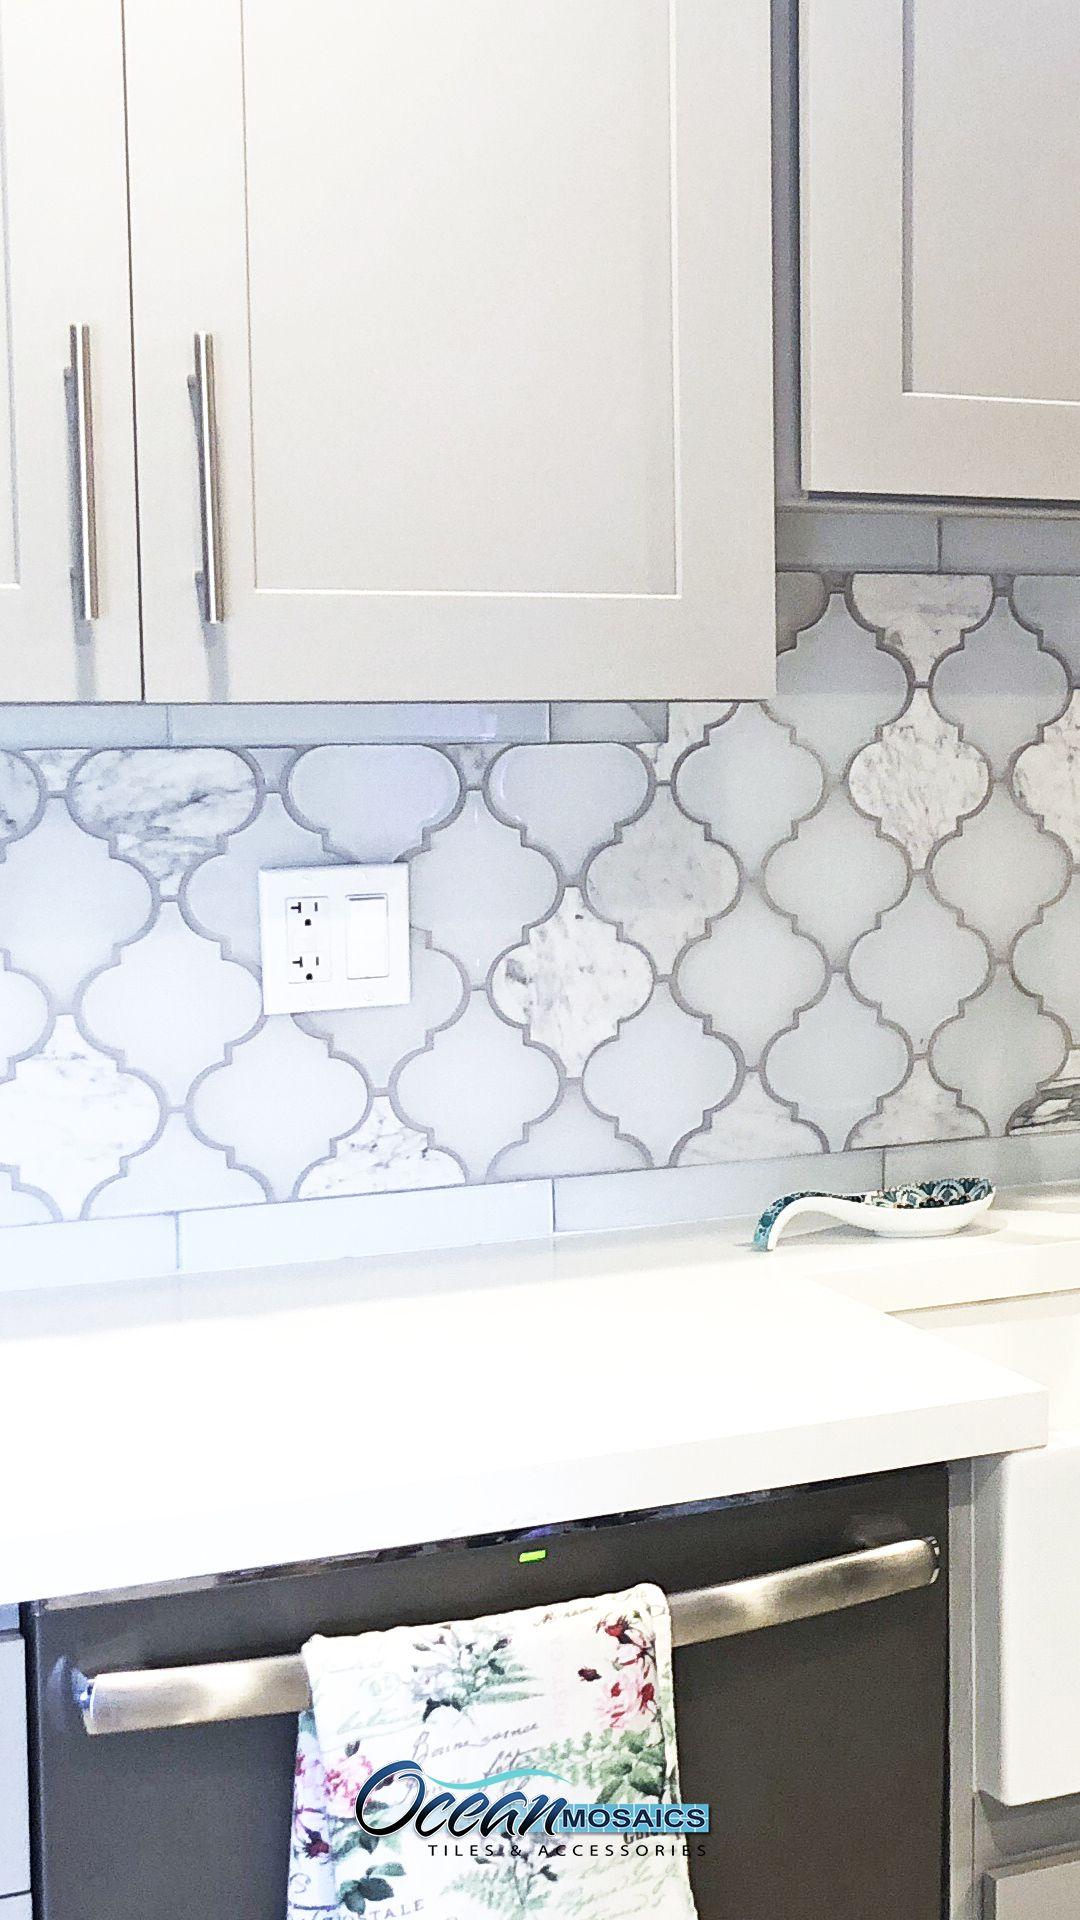 Merola Tile Antic Sensations Agua Marina 3 In X 6 In Ceramic Wall Subway Tile 4 38 Sq Ft Case Wcvasna The Home Depot Unique Kitchen Backsplash Ceramic Wall Tiles Colorful Kitchen Backsplash